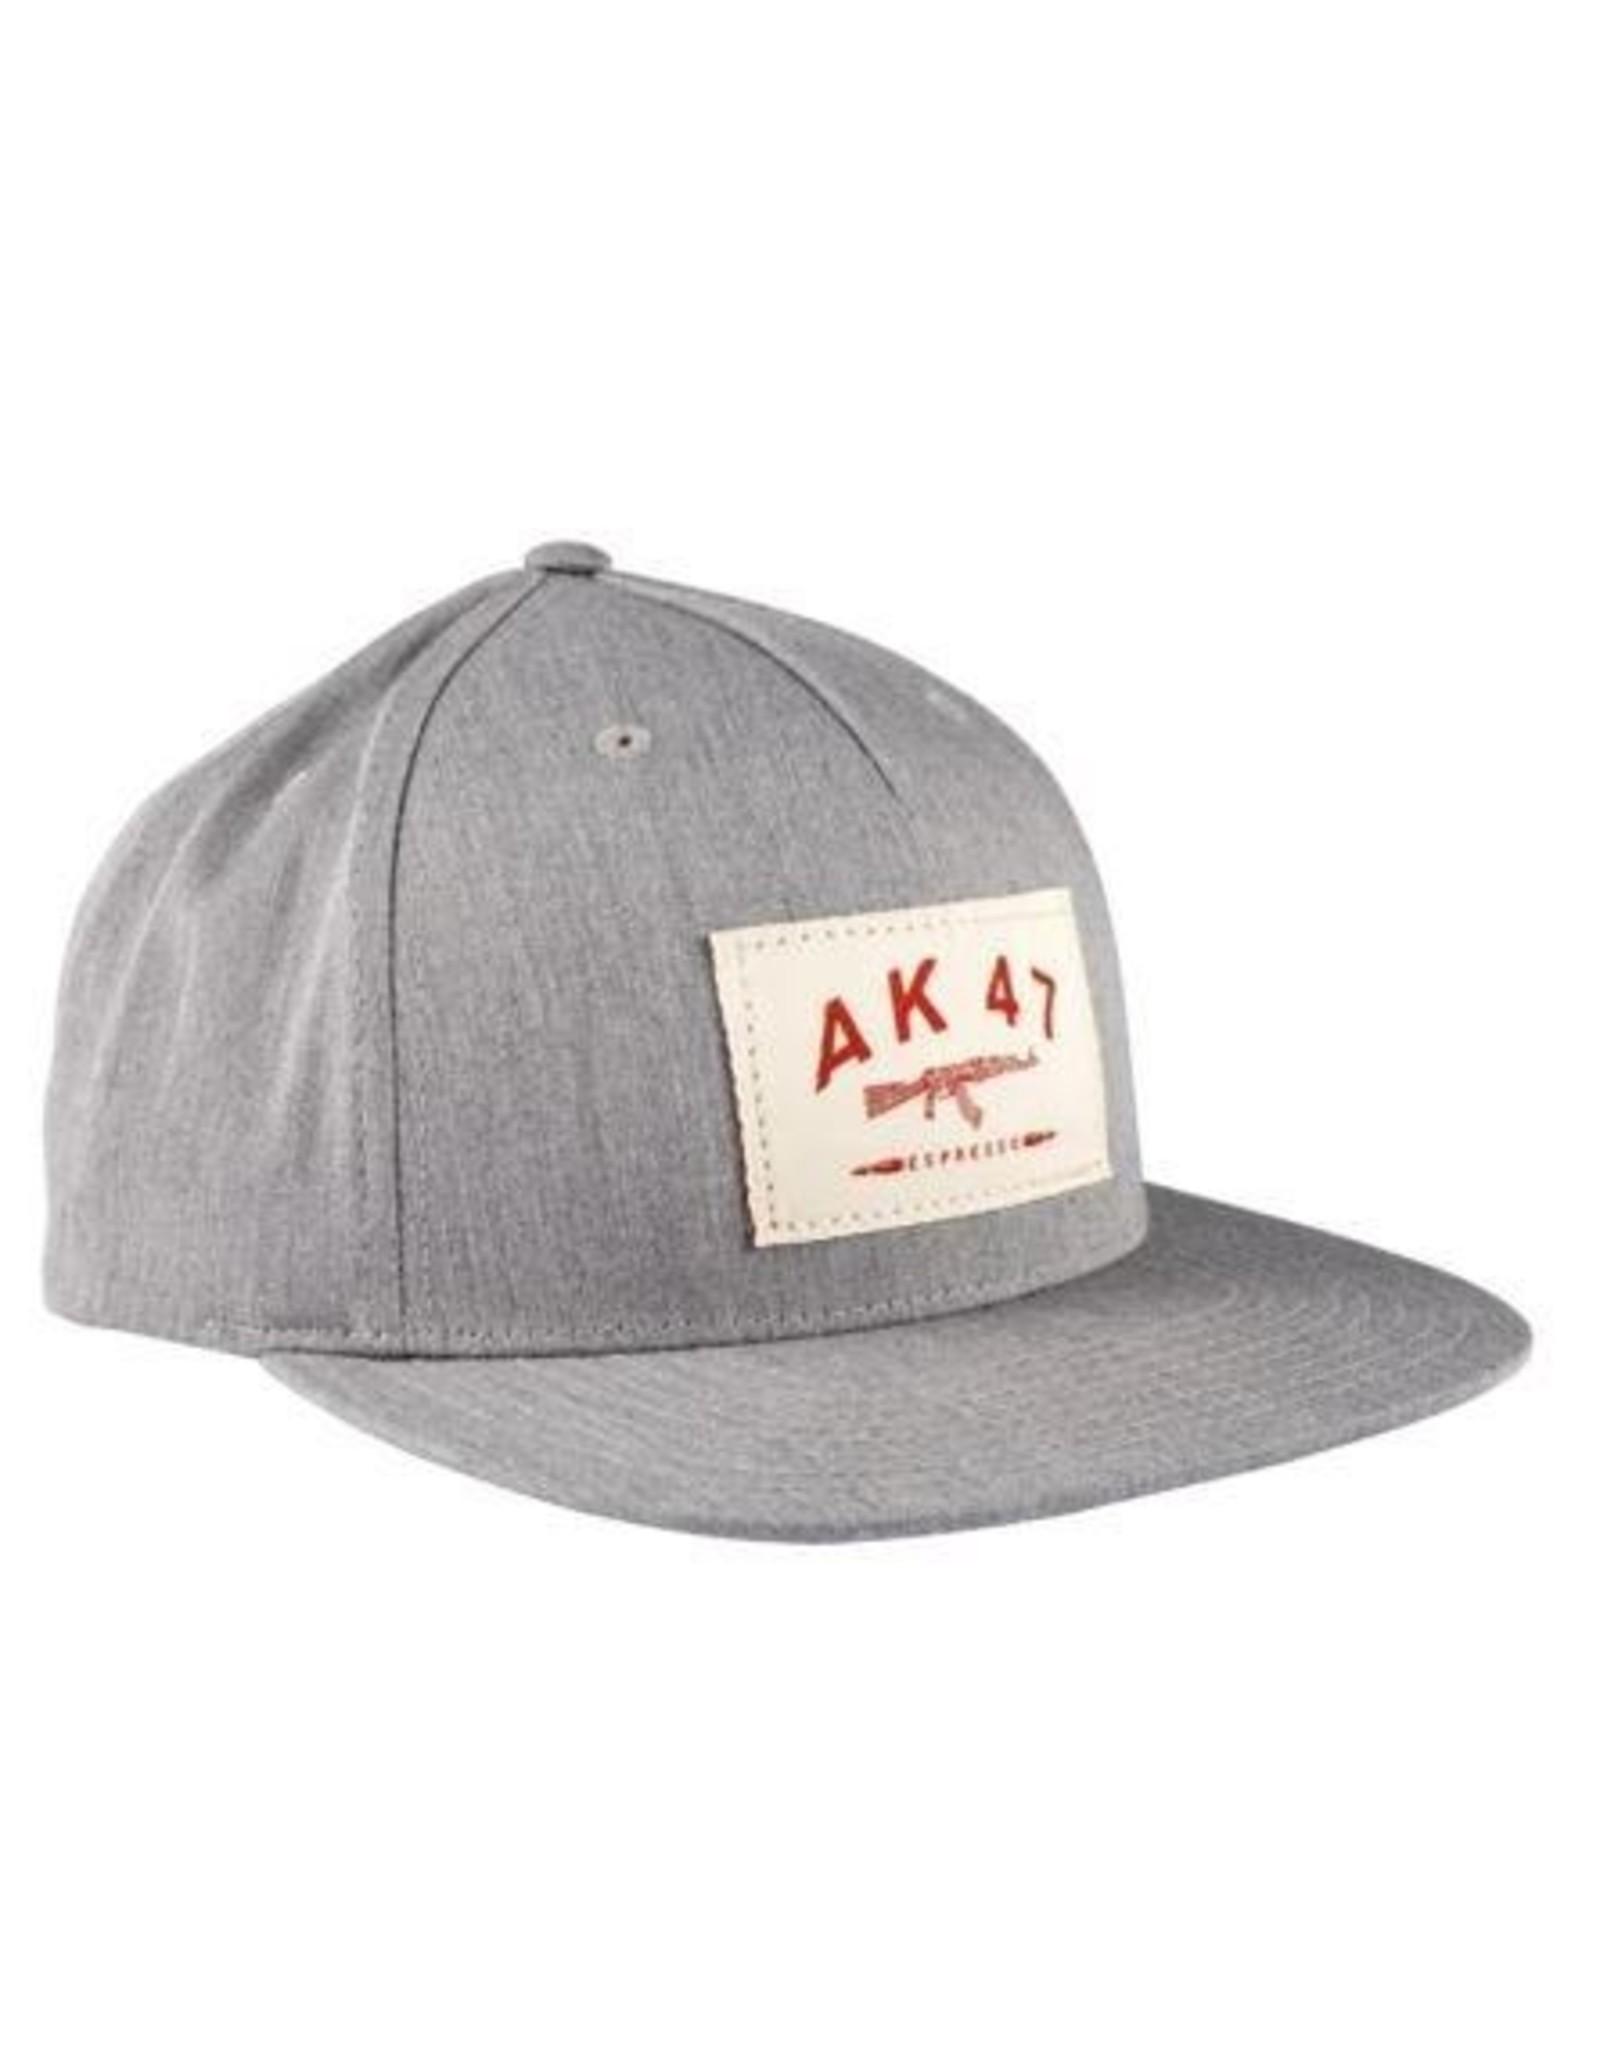 BRCC - AK47 Espresso Hat